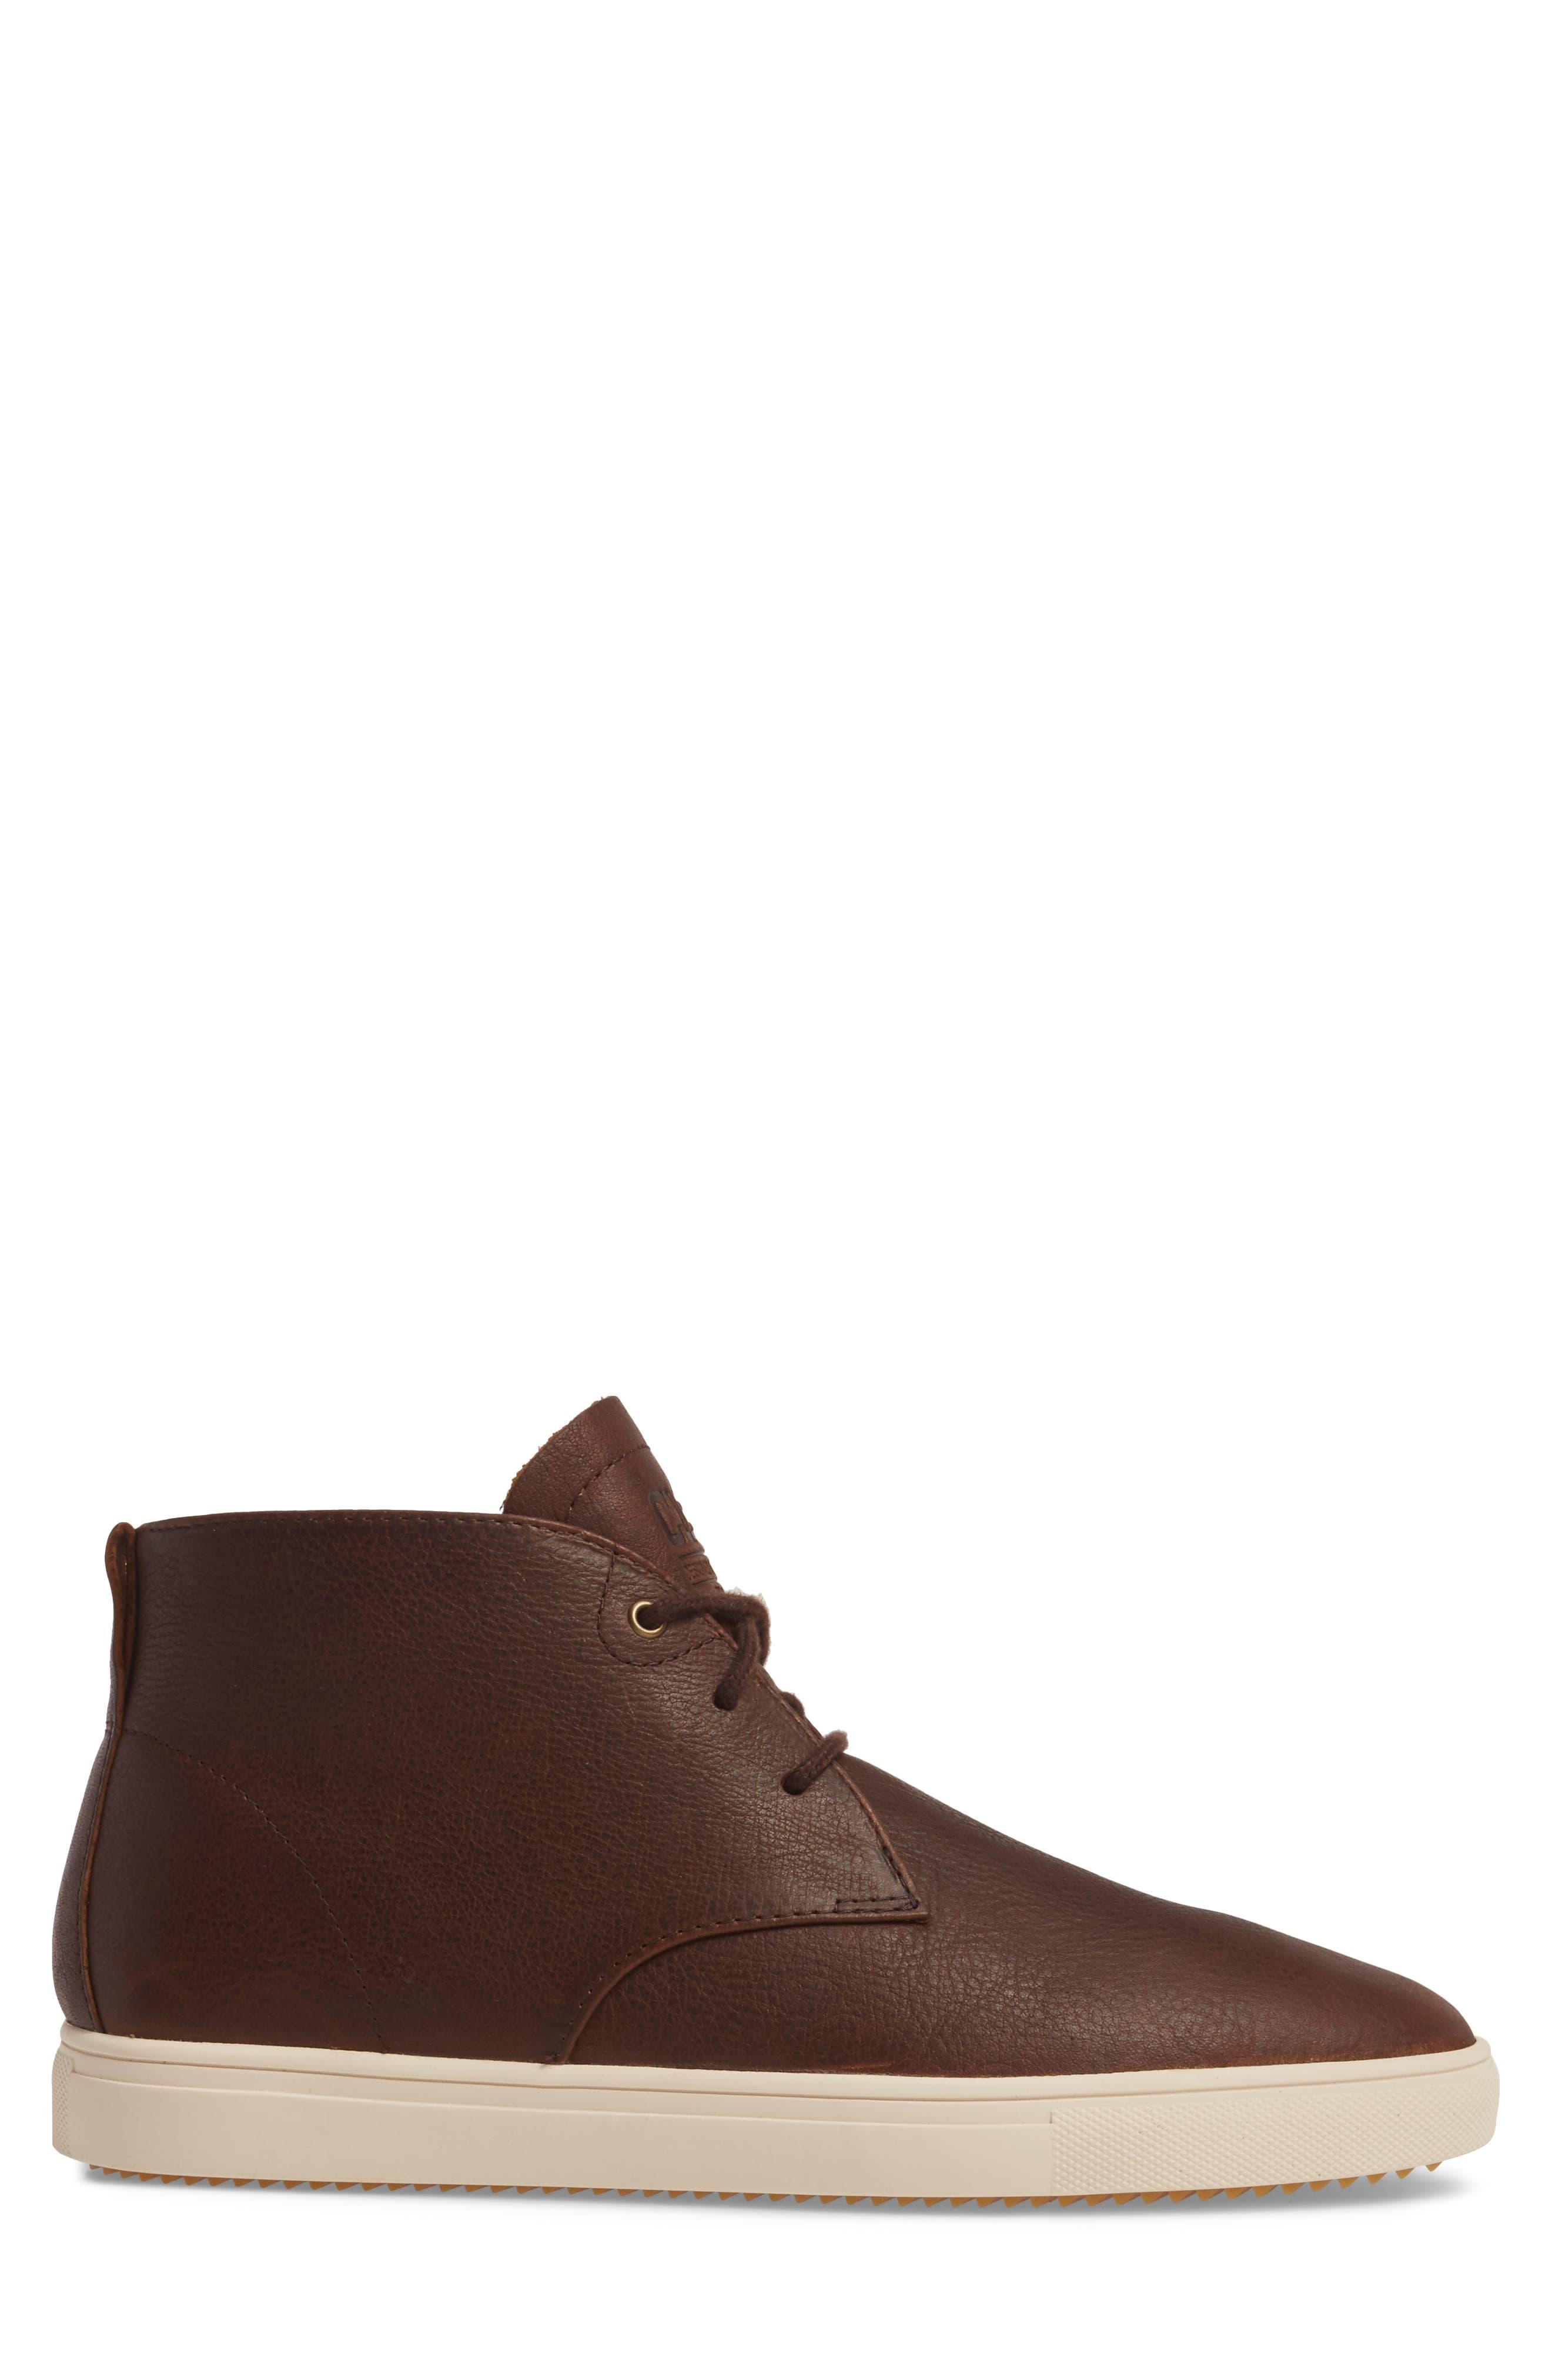 'Strayhorn SP' Chukka Boot,                             Alternate thumbnail 3, color,                             Cocoa Leather